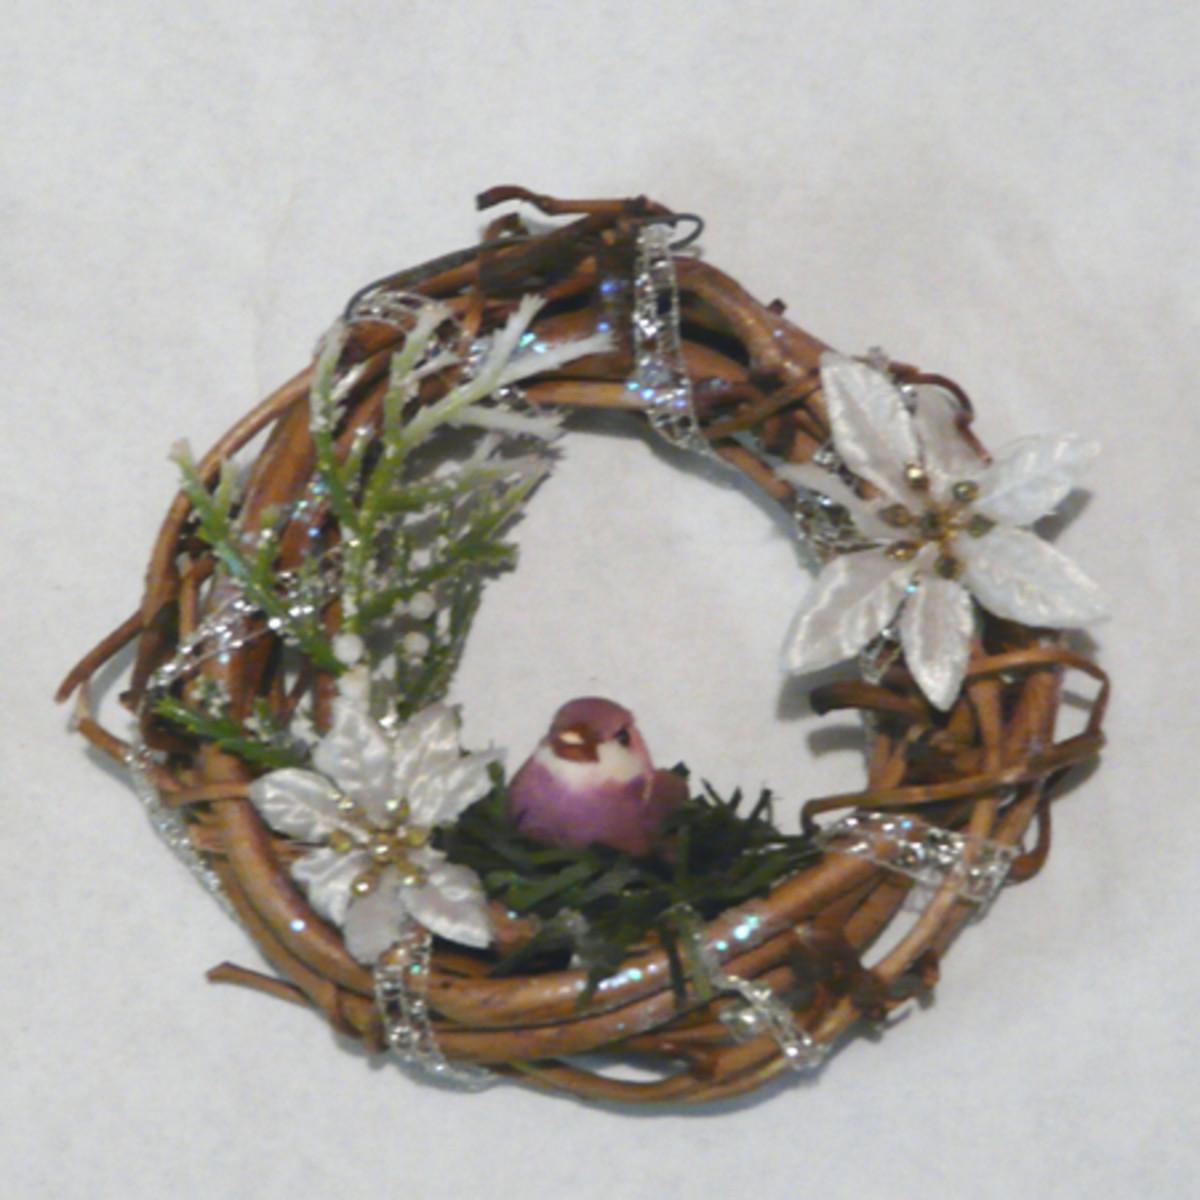 Mini Wreath Ornament with bird